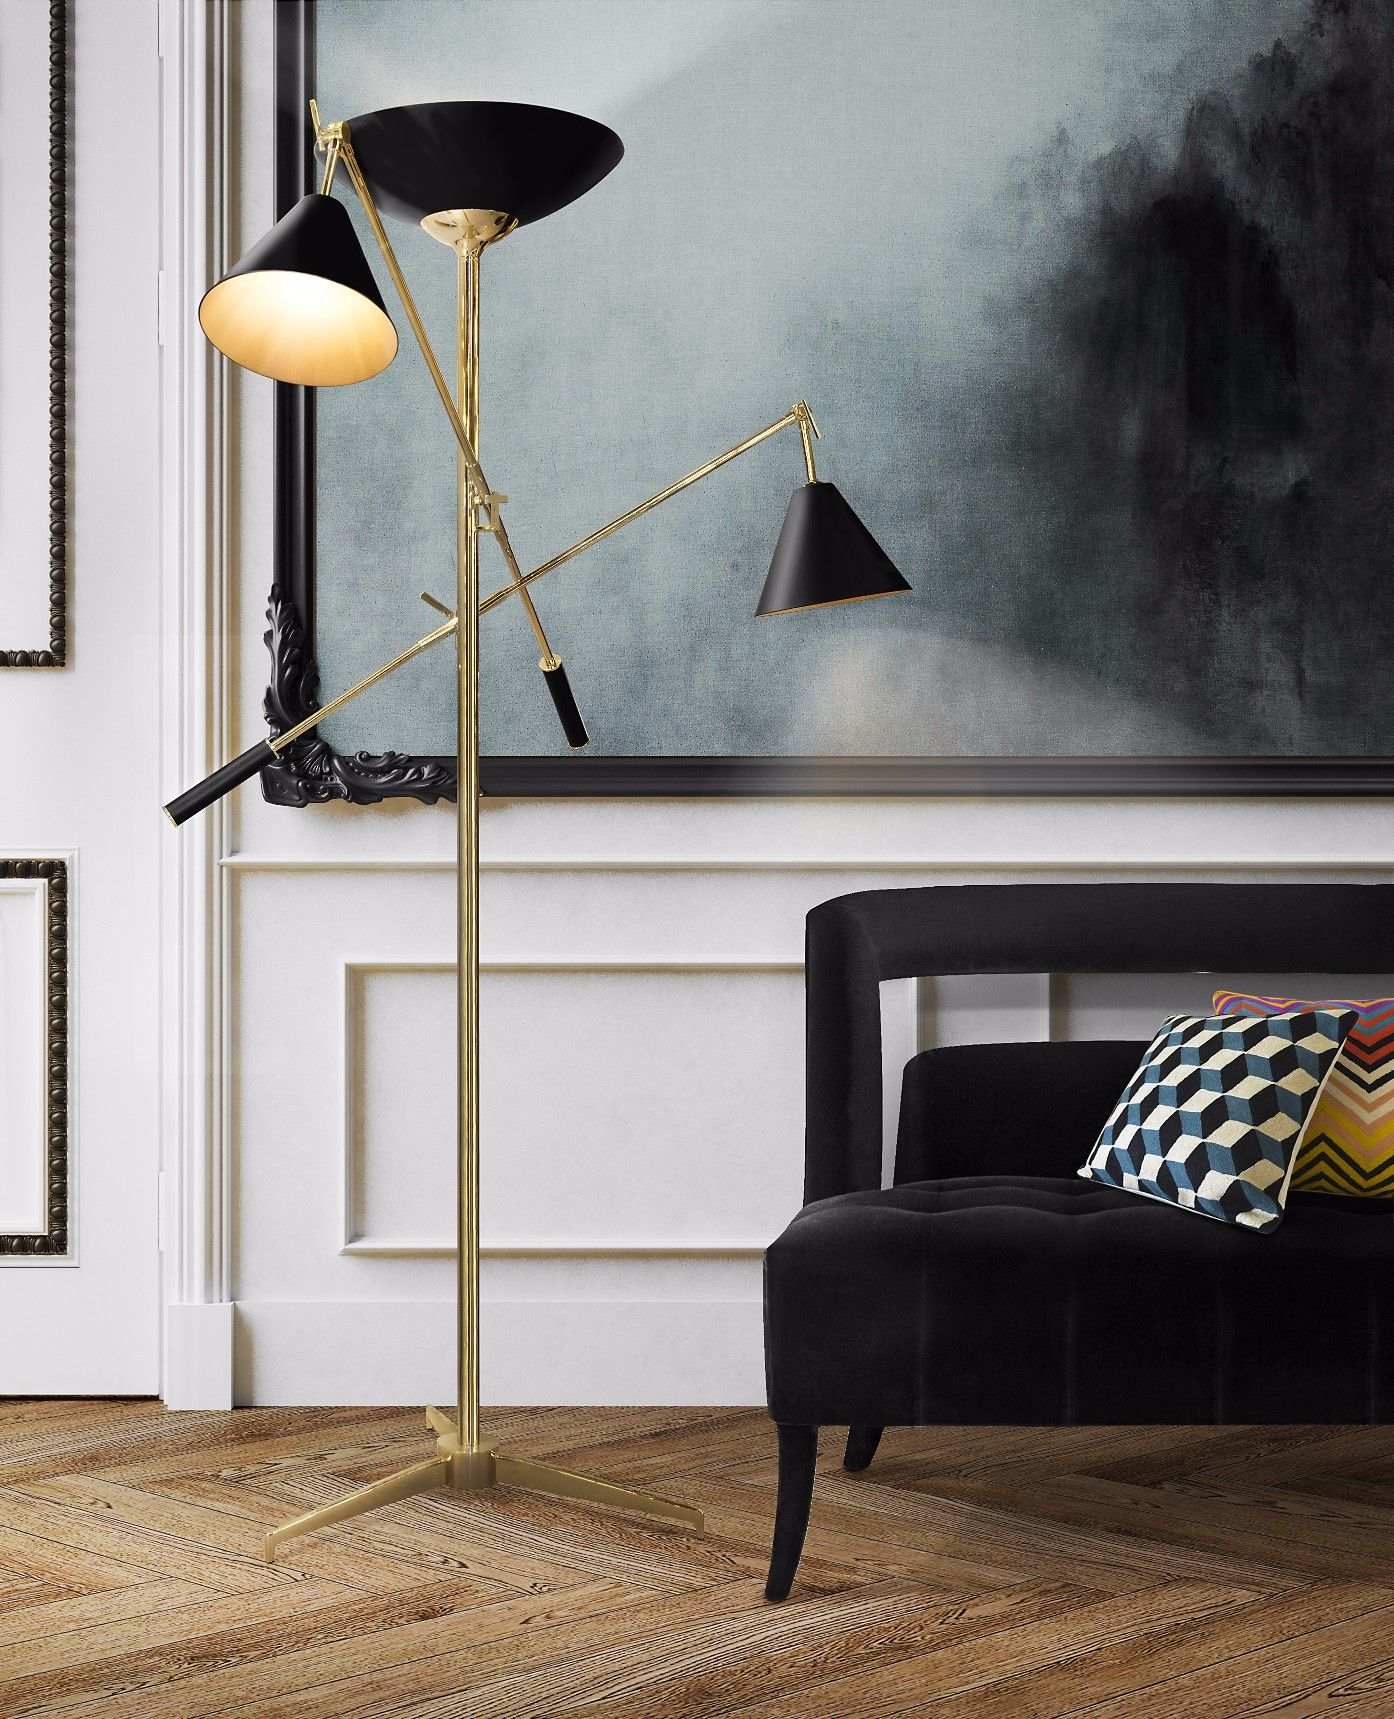 Lampada Da Studio Design torchiere floor lamp | modern floor lamps, home interior